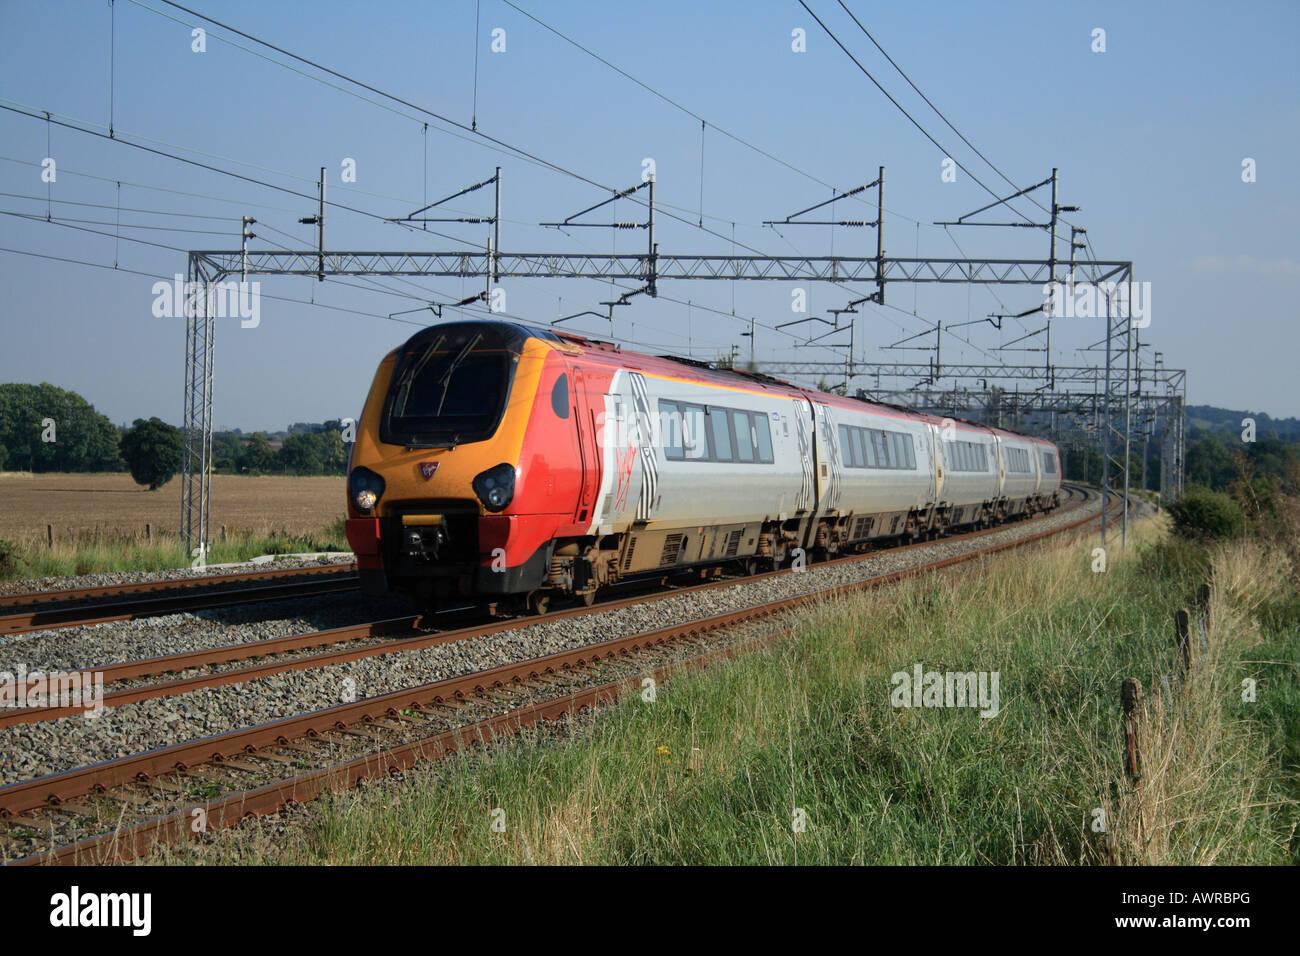 Virgin trains 2007 jelsoft enterprises ltd